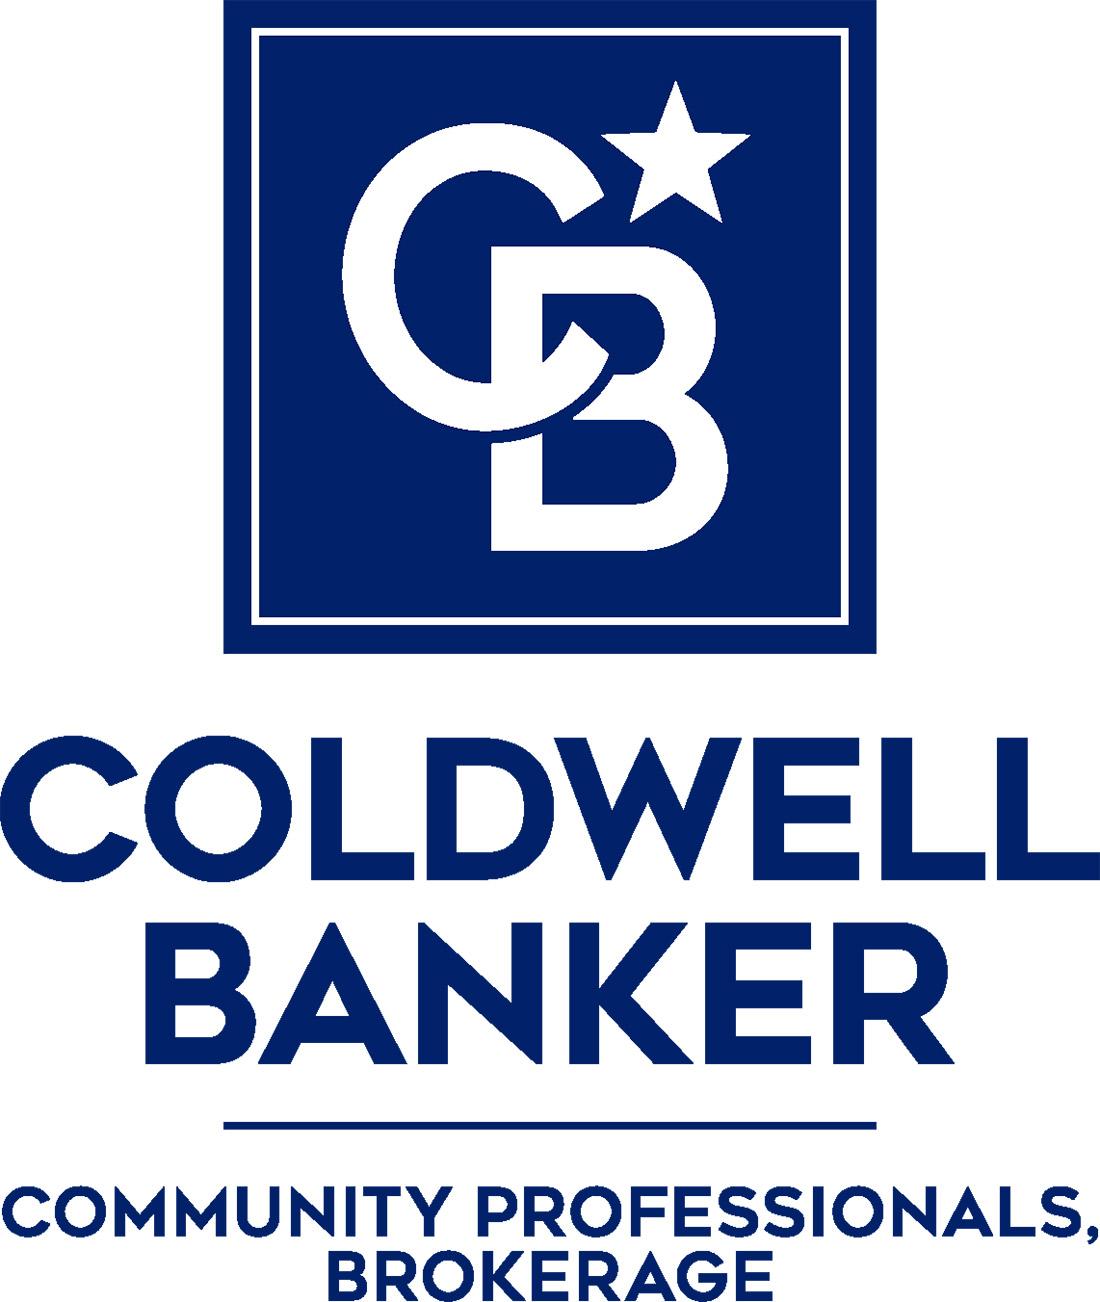 Ava Kiilaspea - Coldwell Banker Community Professionals Logo